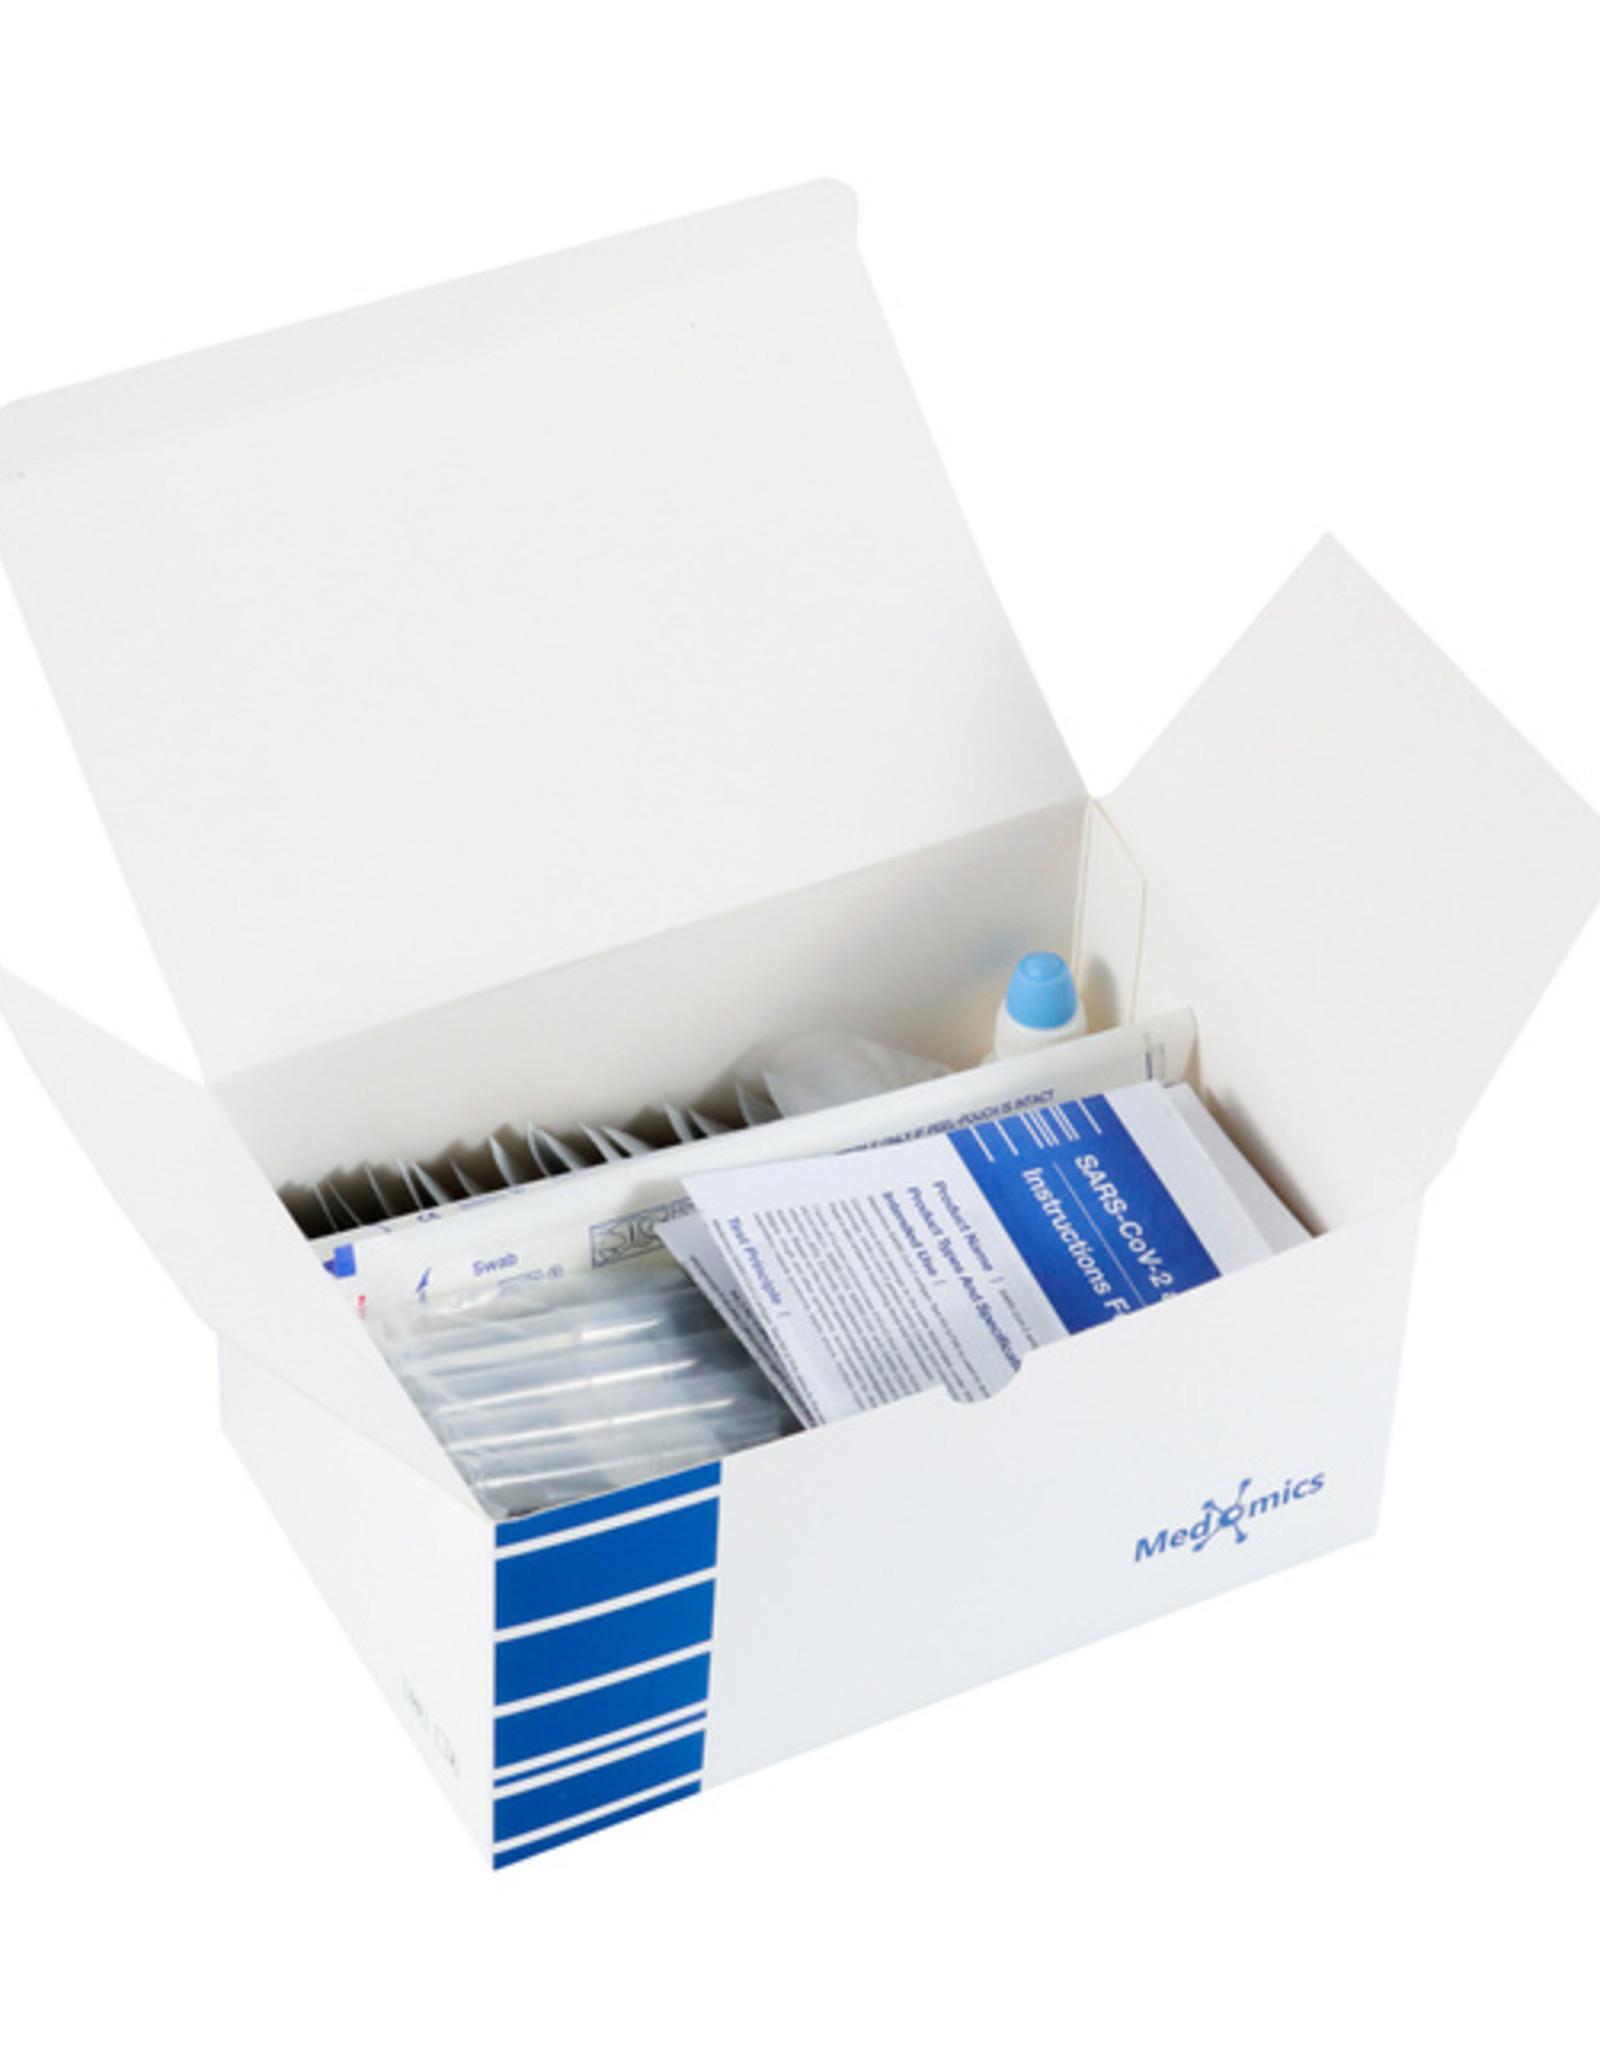 COVID 19 - SARS-CoV-2-antigeen (LFIA) - 20 tests